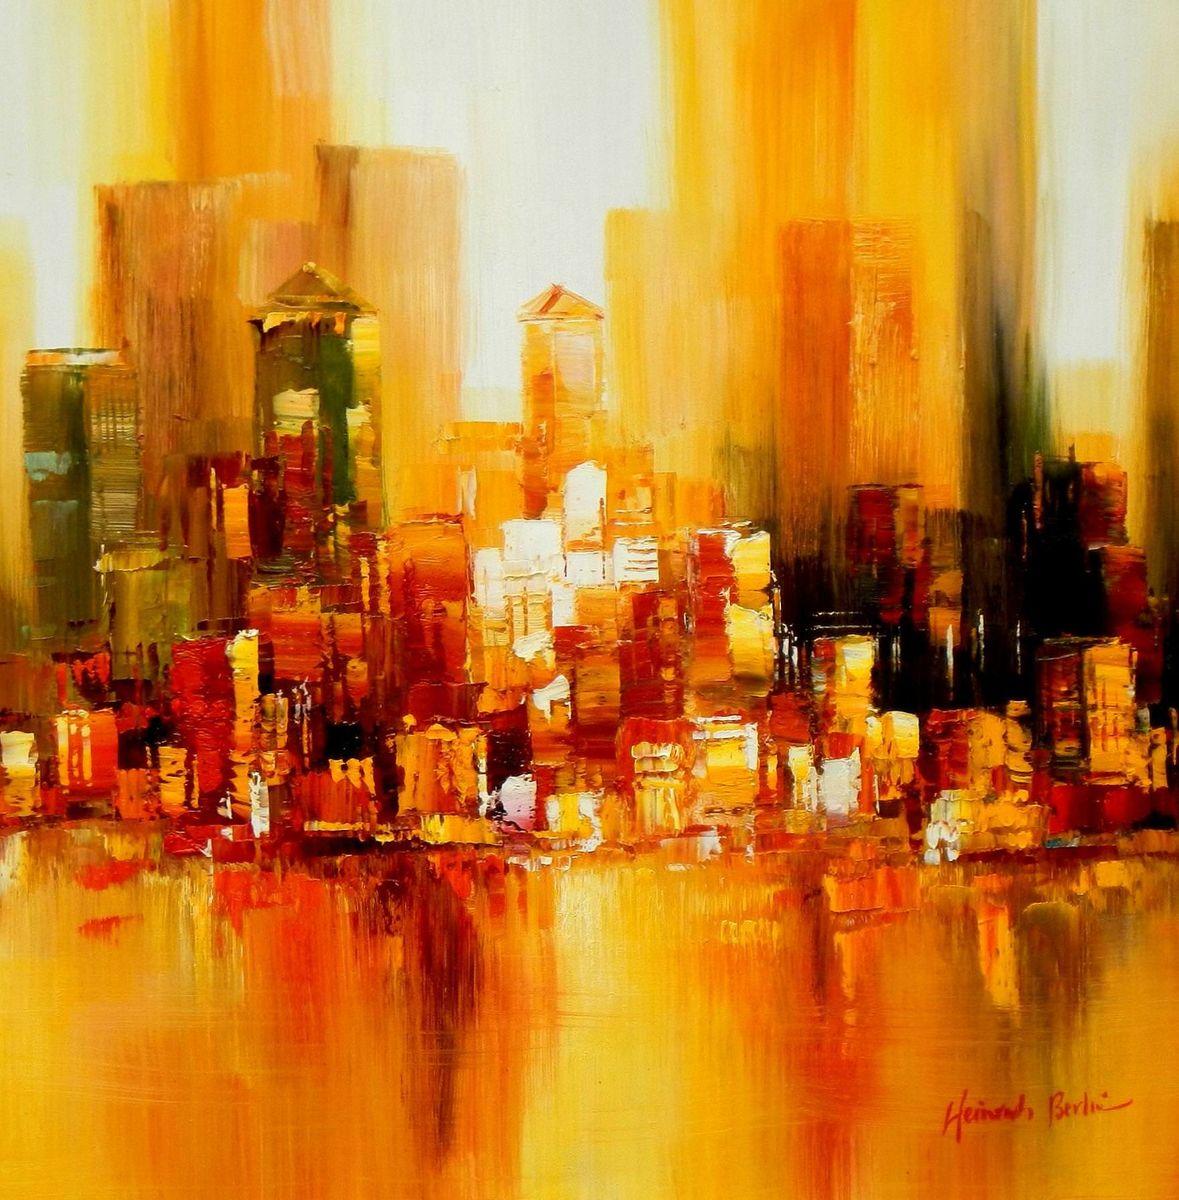 Abstrakt New York Manhattan Skyline im Herbst e93411 60x60cm abstraktes Ölbild